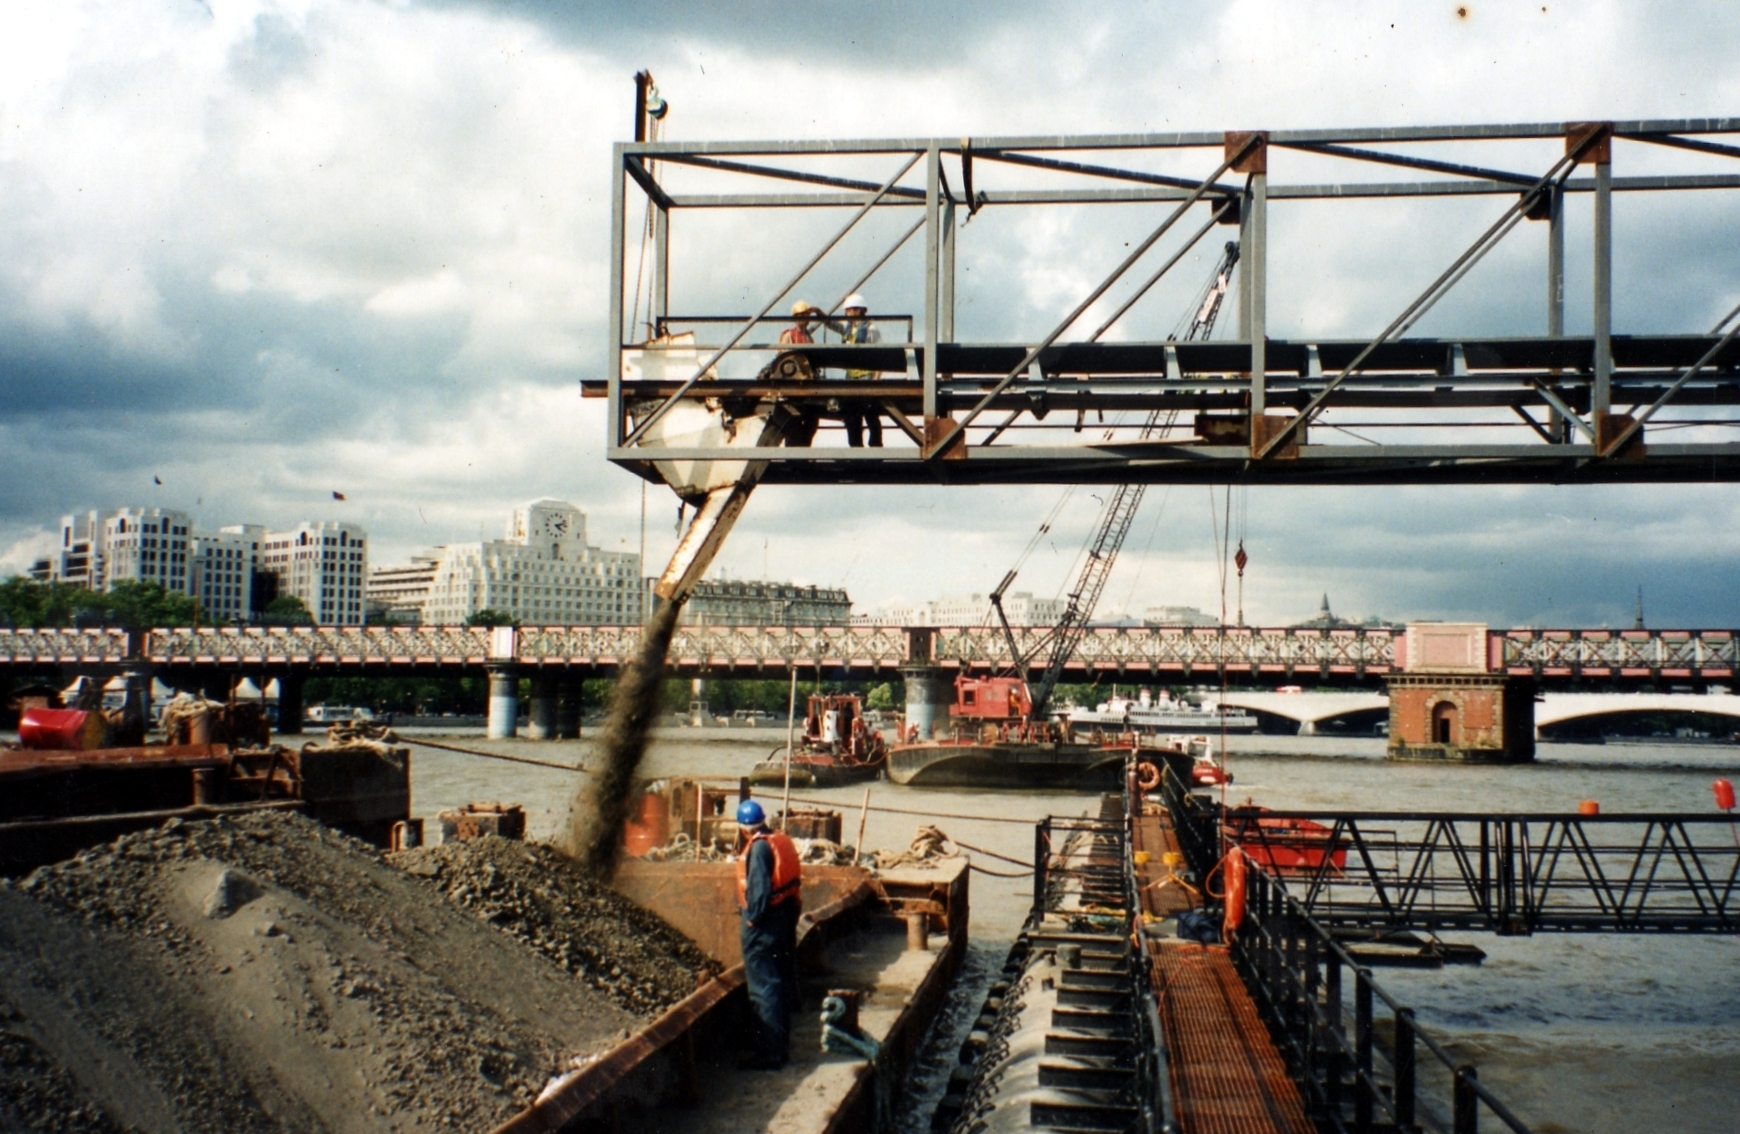 Jubilee gardens pier london marine design construction for Design construction